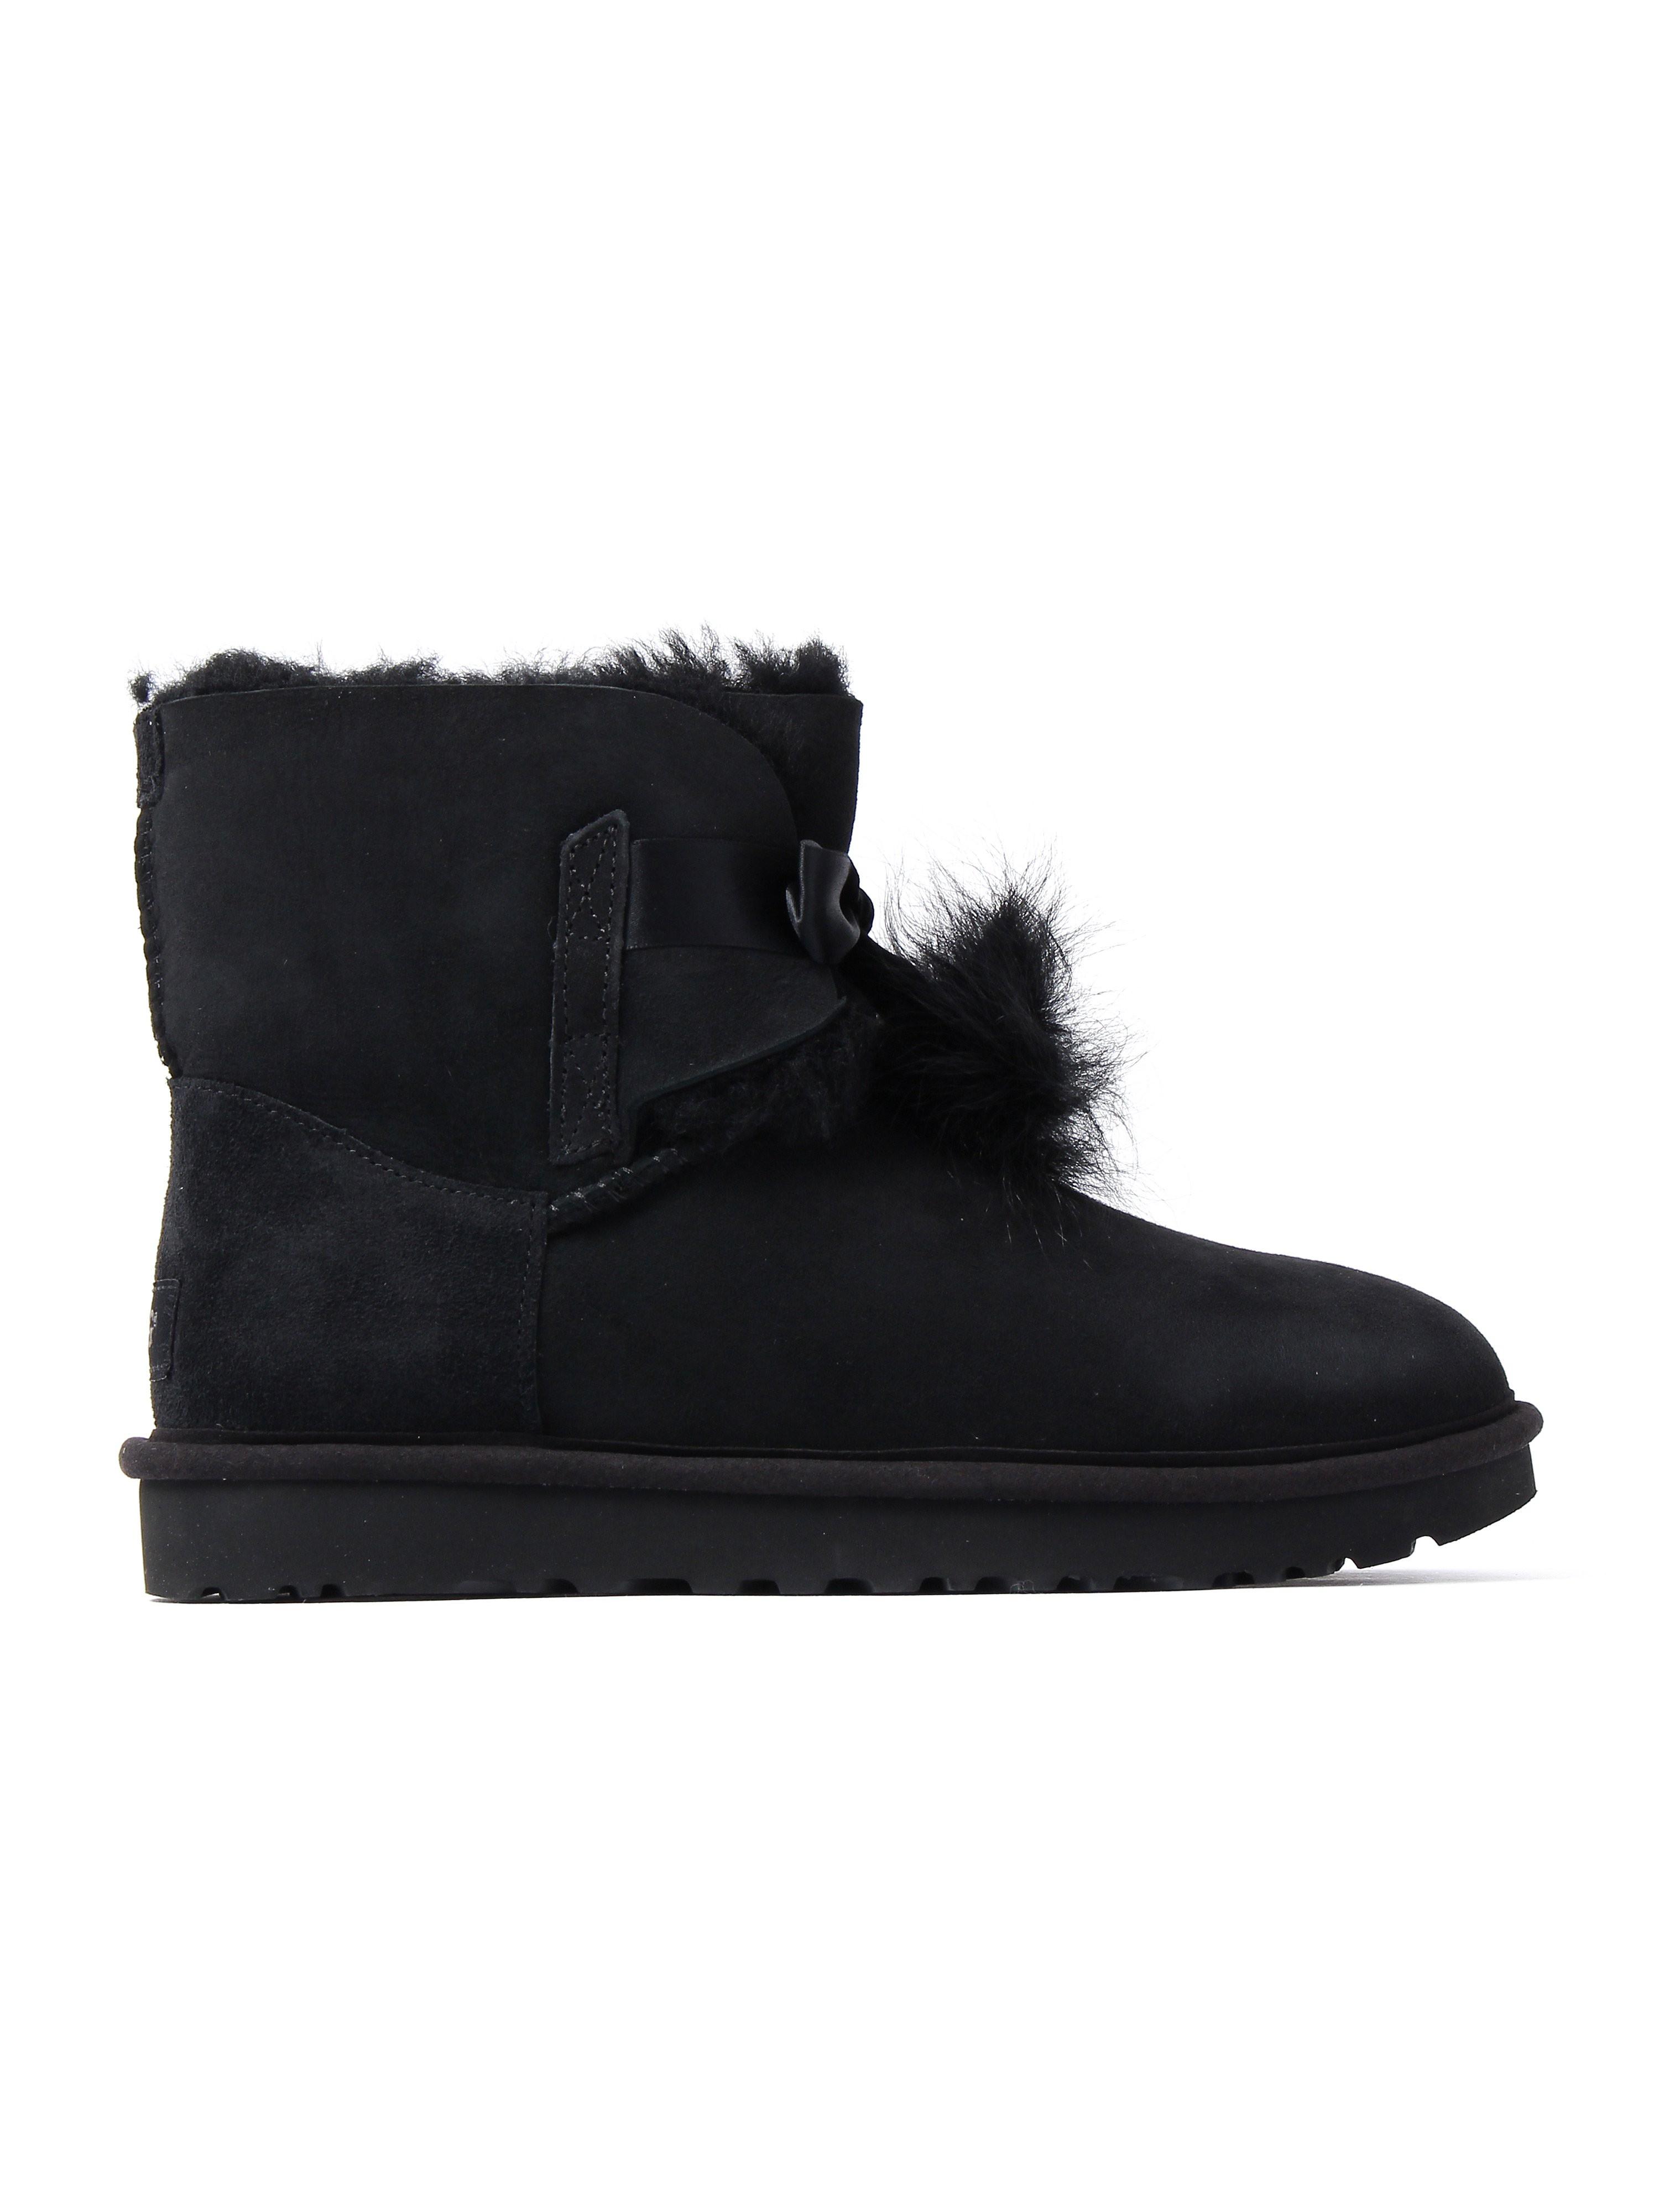 UGG Women's Gita Twinface Boots - Black Suede